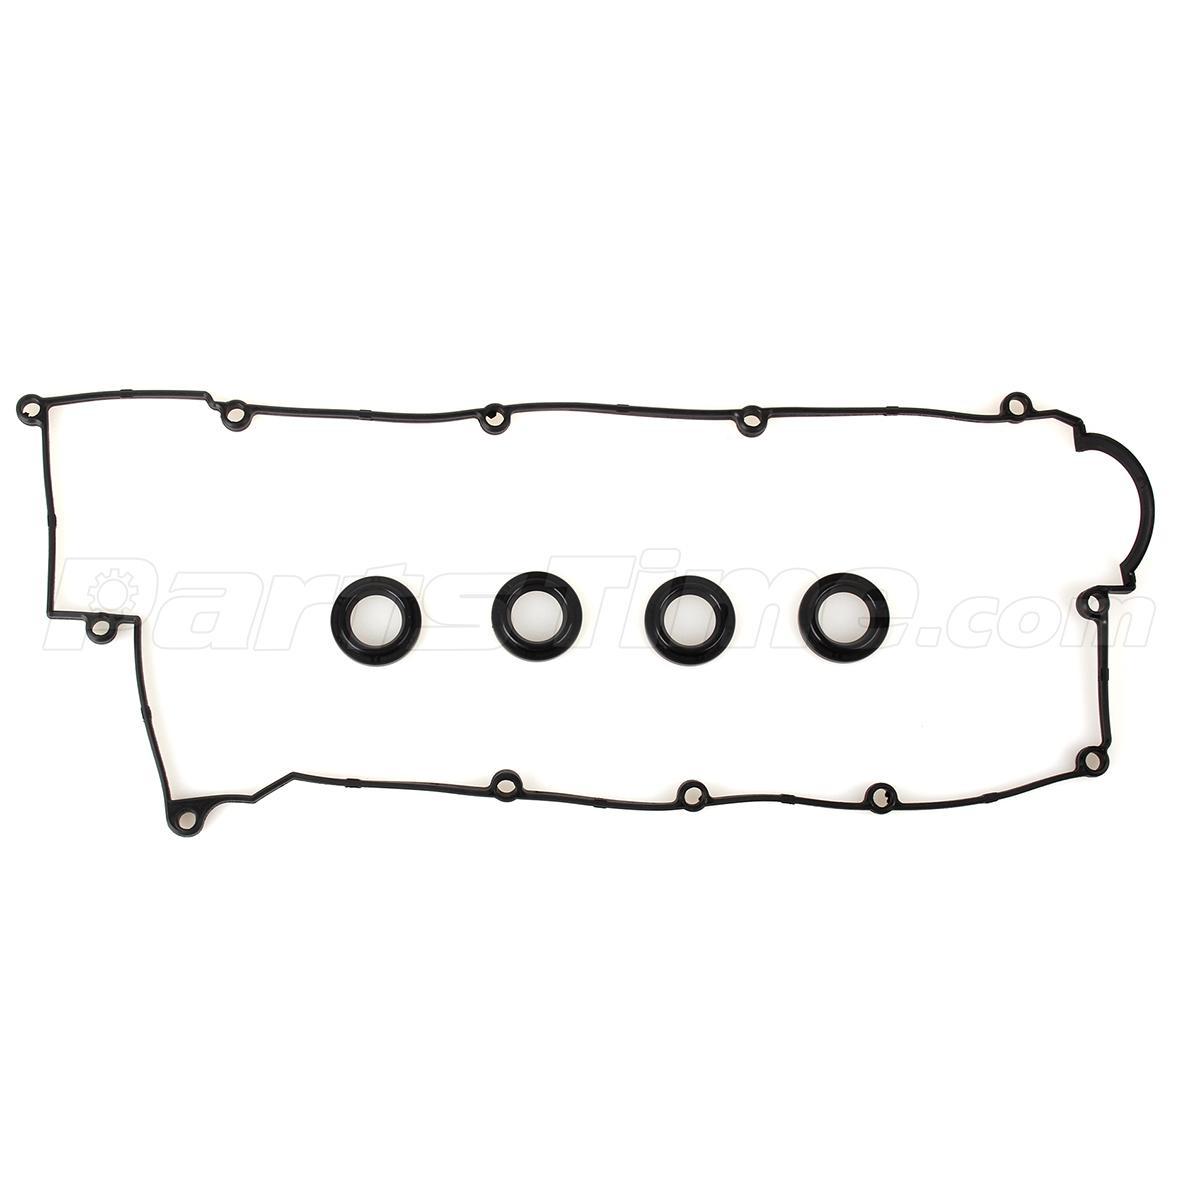 Fits 03-12 HYUNDAI KIA SPECTRA 2.0L DOHC L4 16V Cylinder